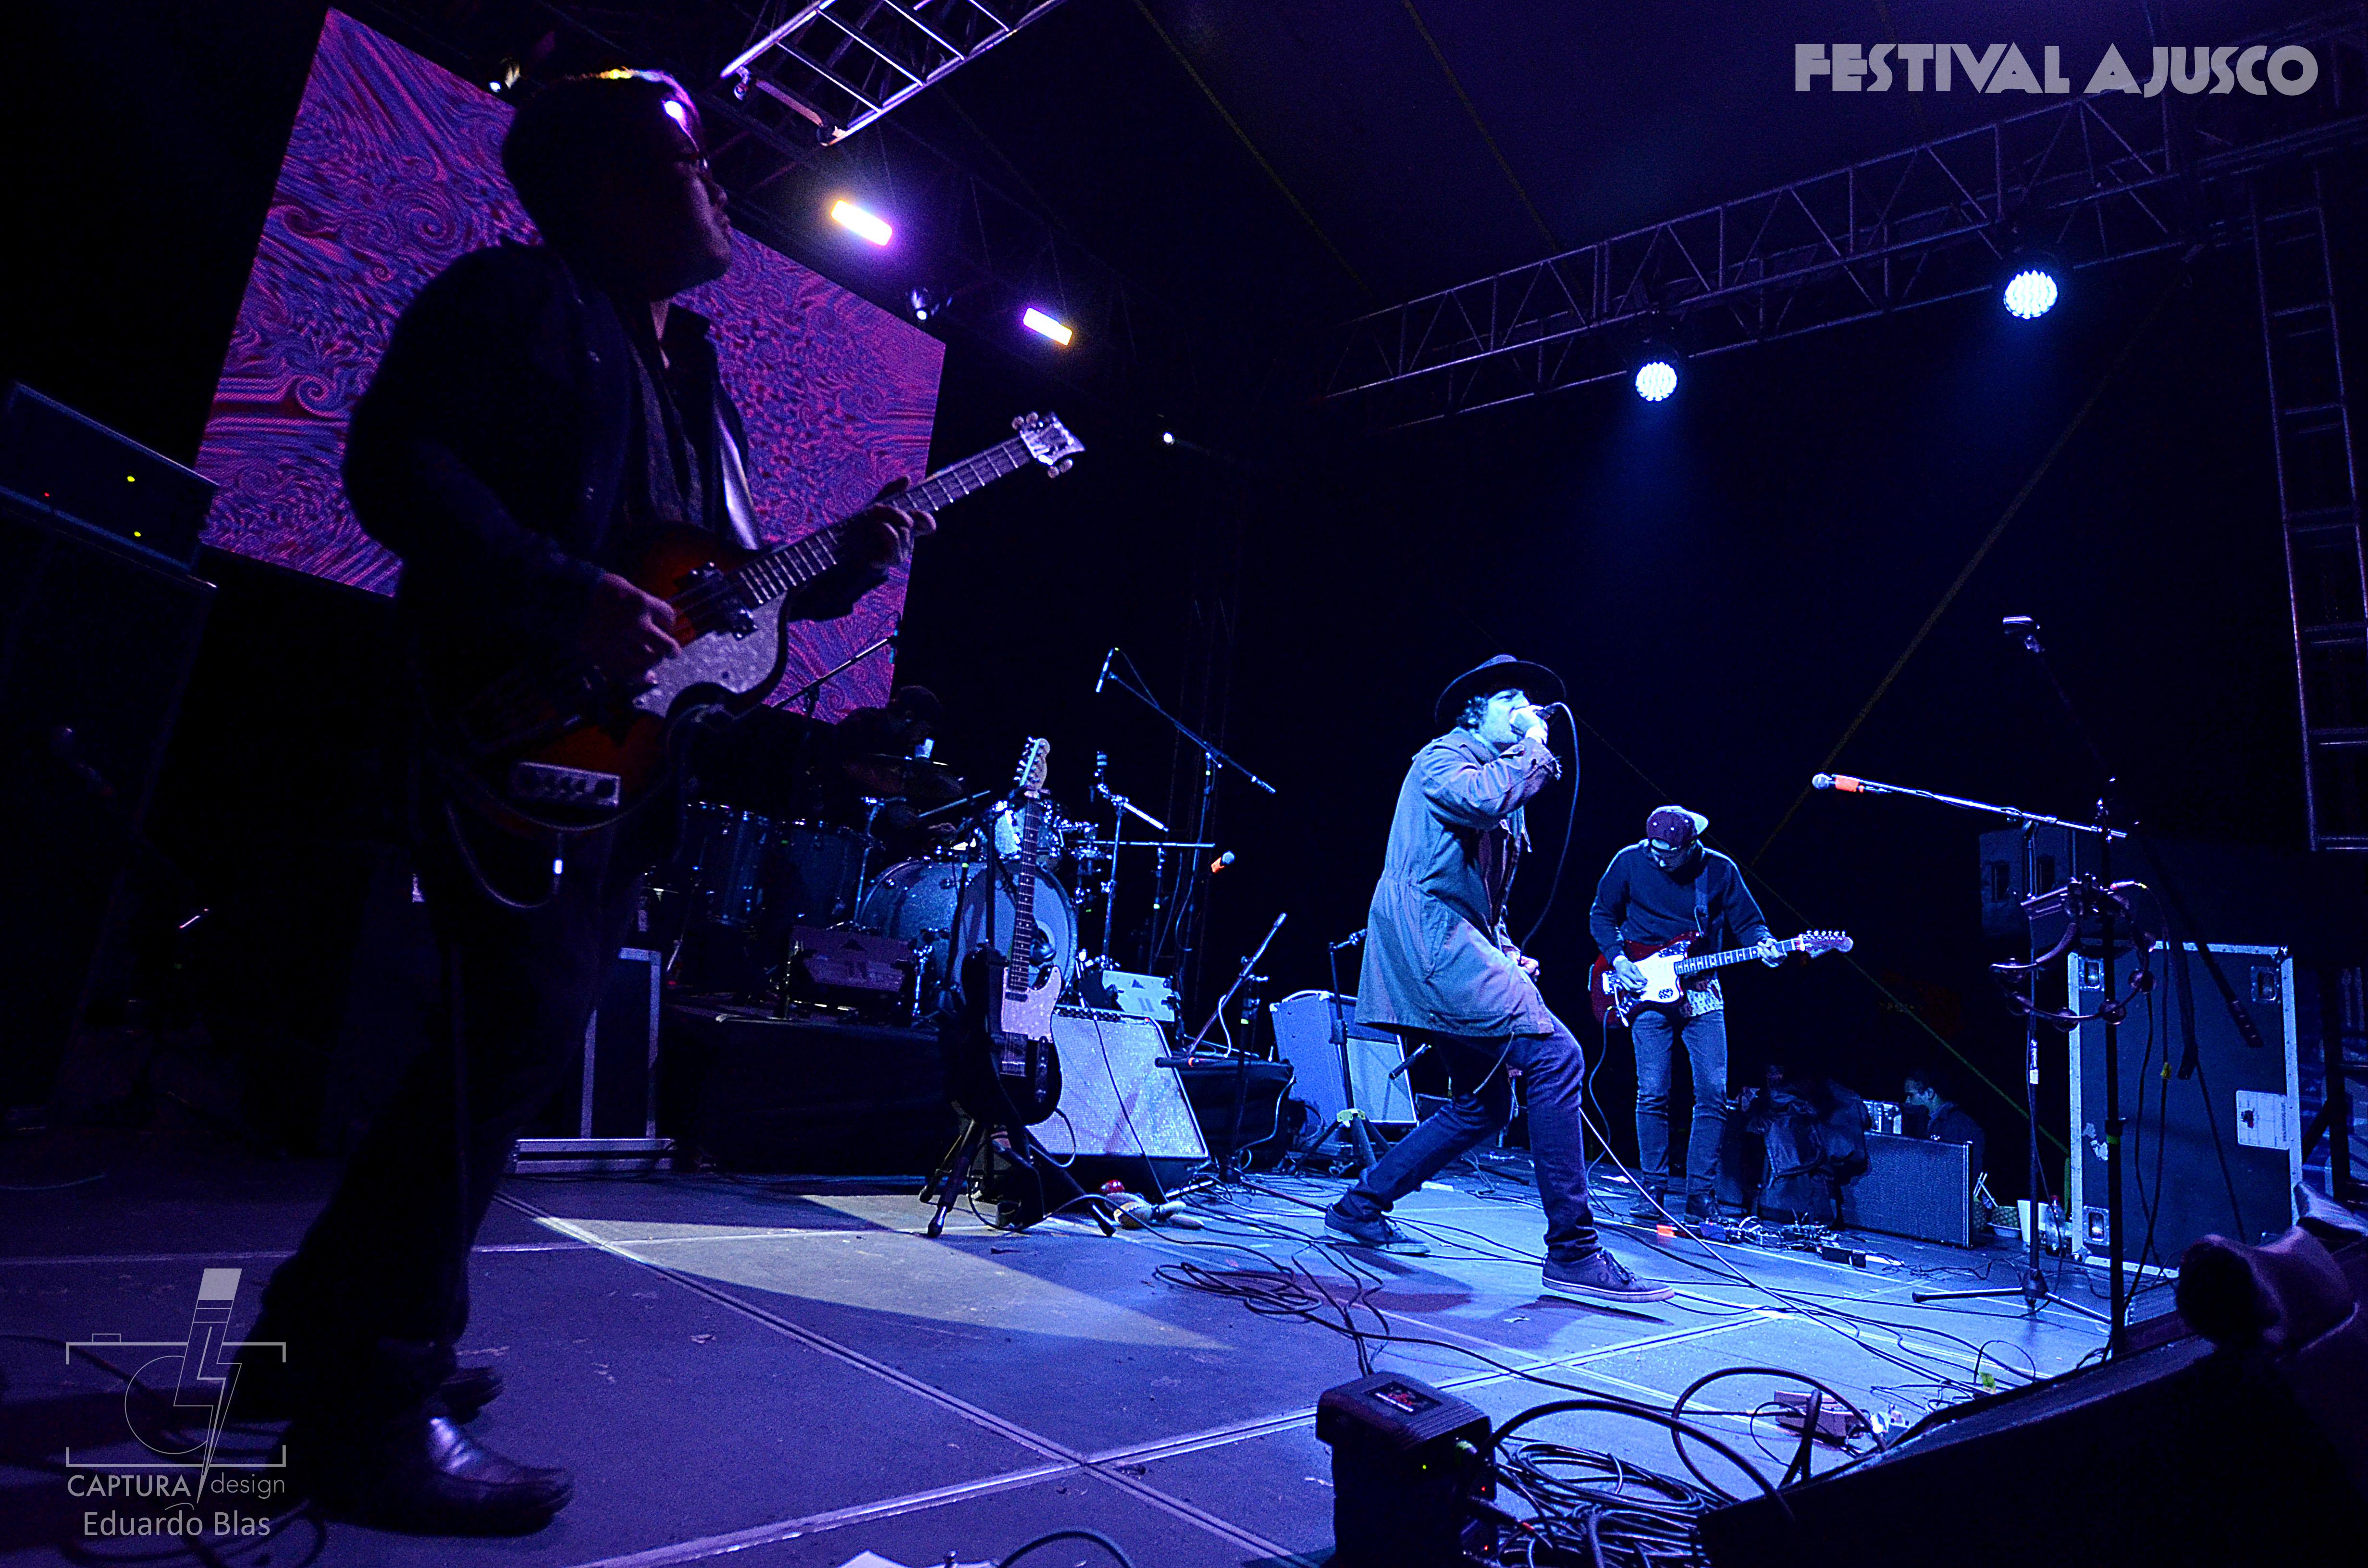 Festival Ajusco, Photo by Eduardo Blas